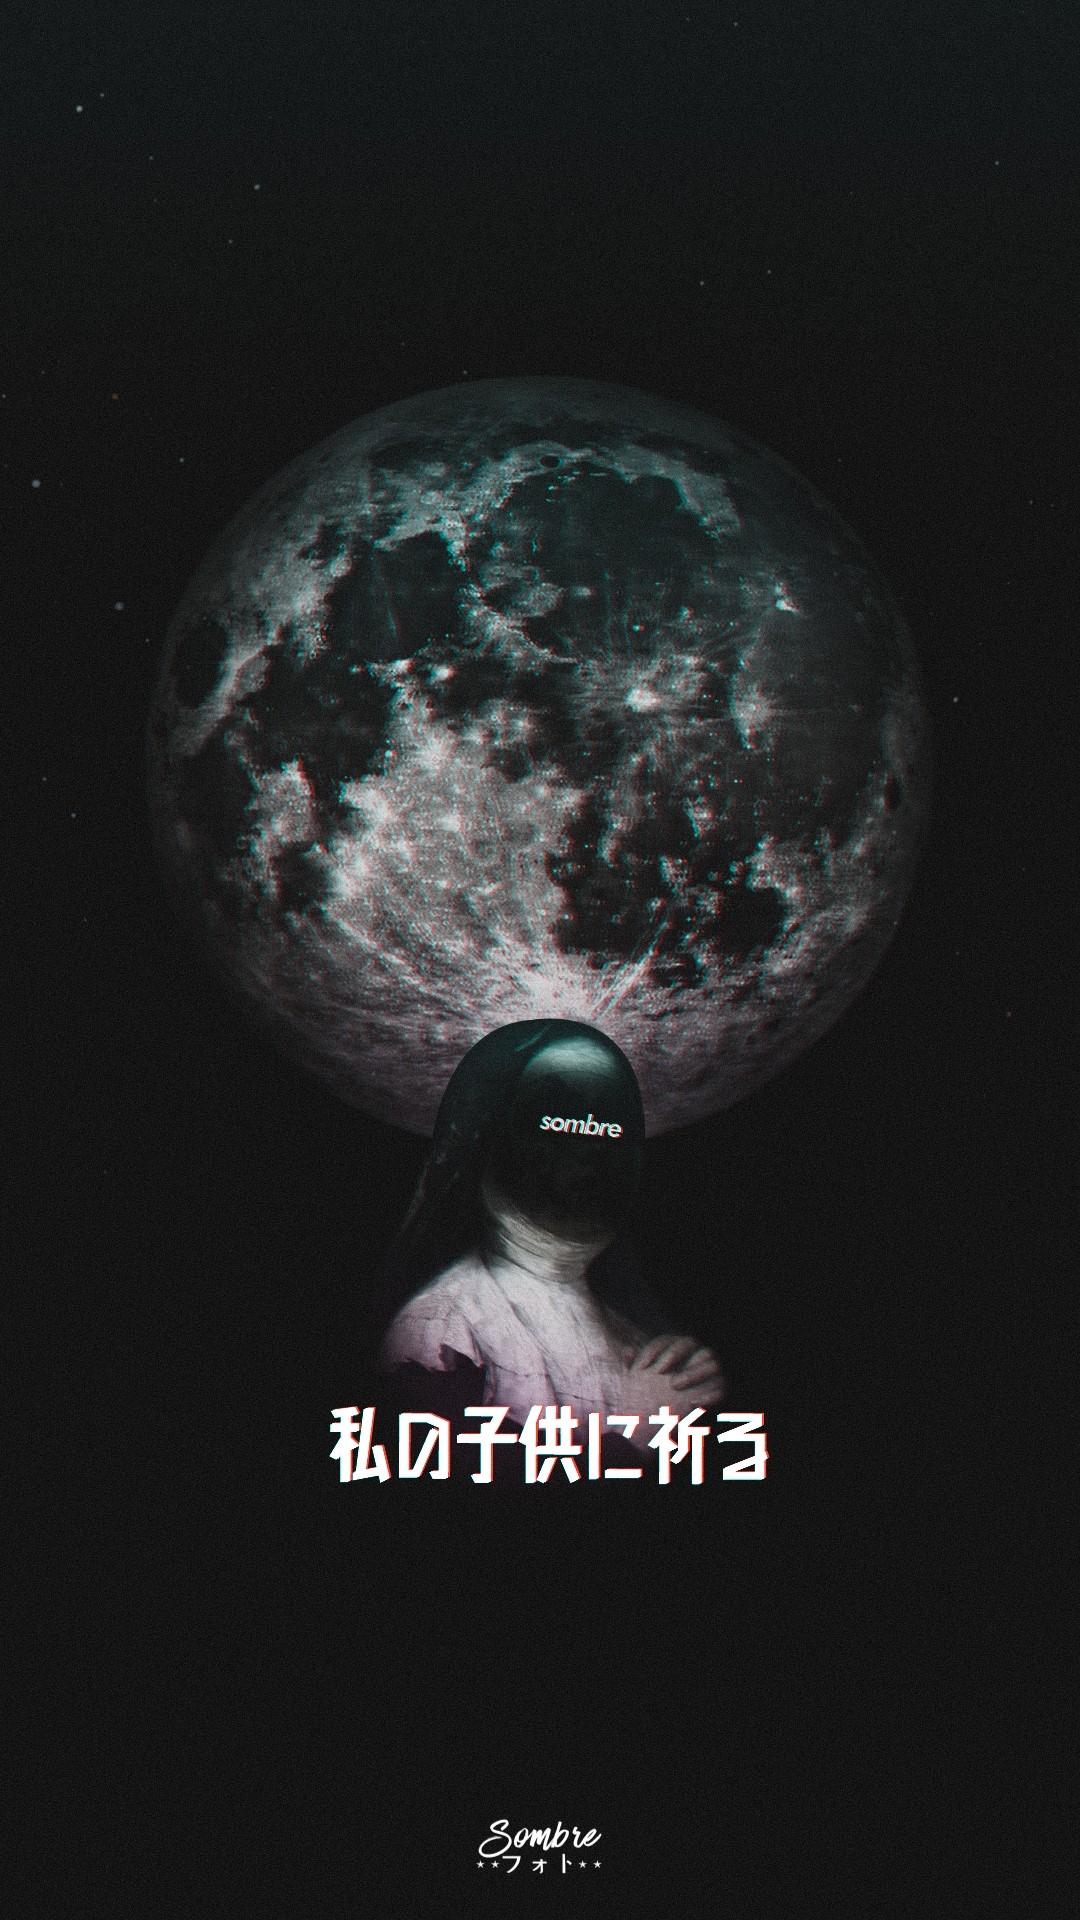 Abstract Moon Nun Phone Wallpaper Sombrenoob